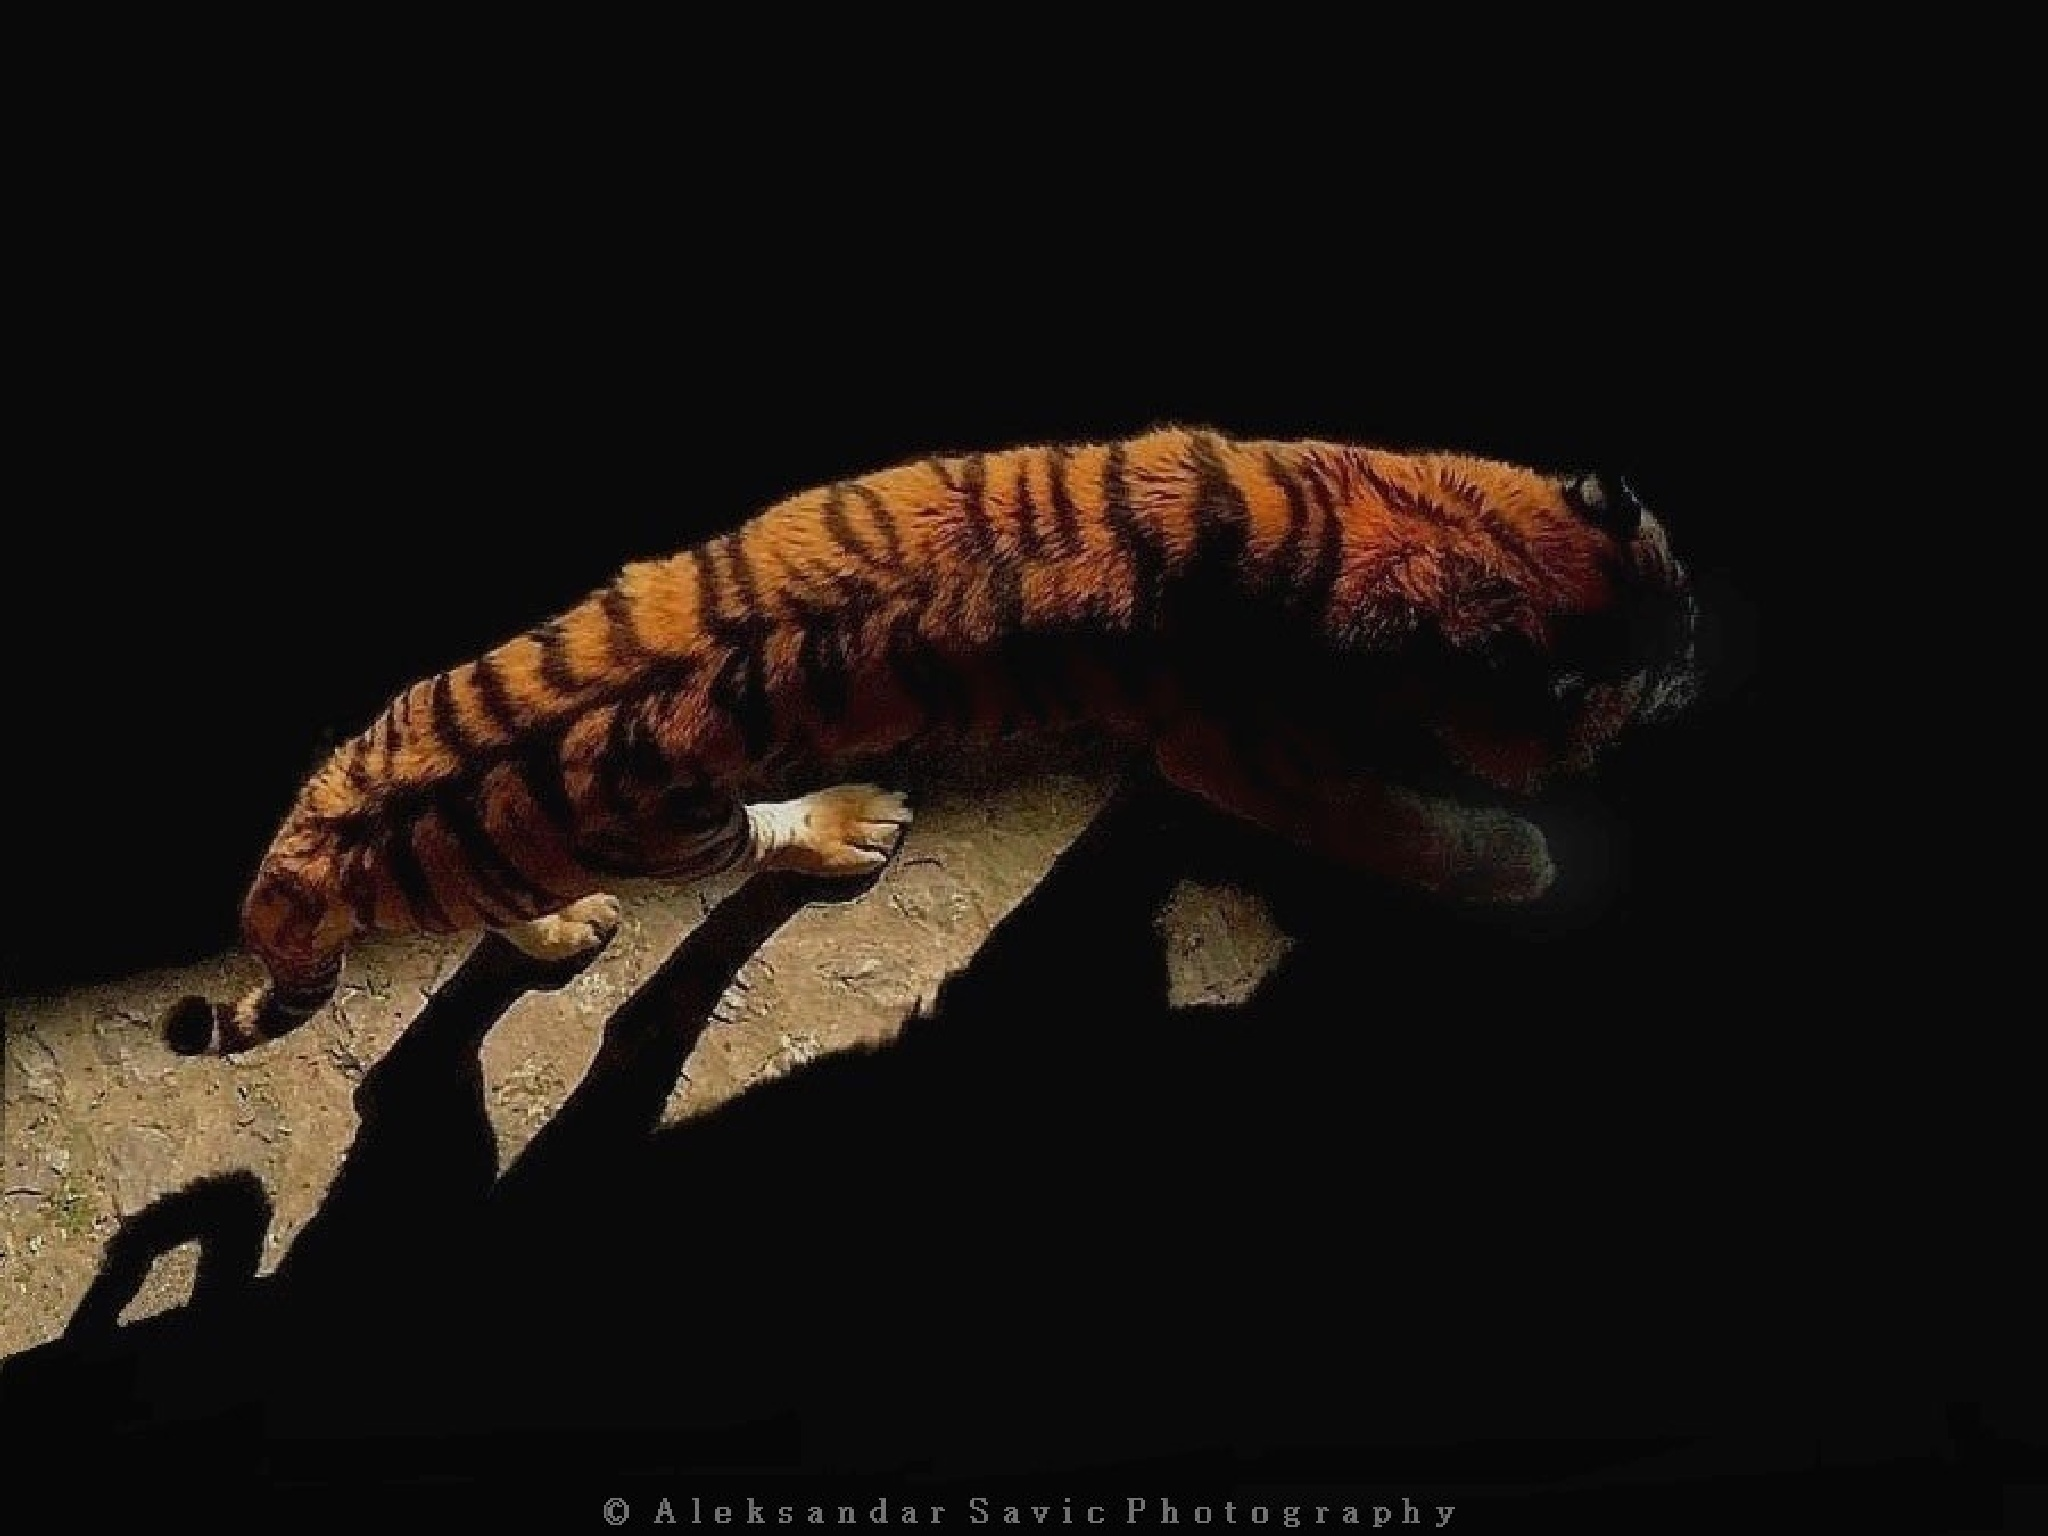 Siberian Tiger by Aleksandar Savic